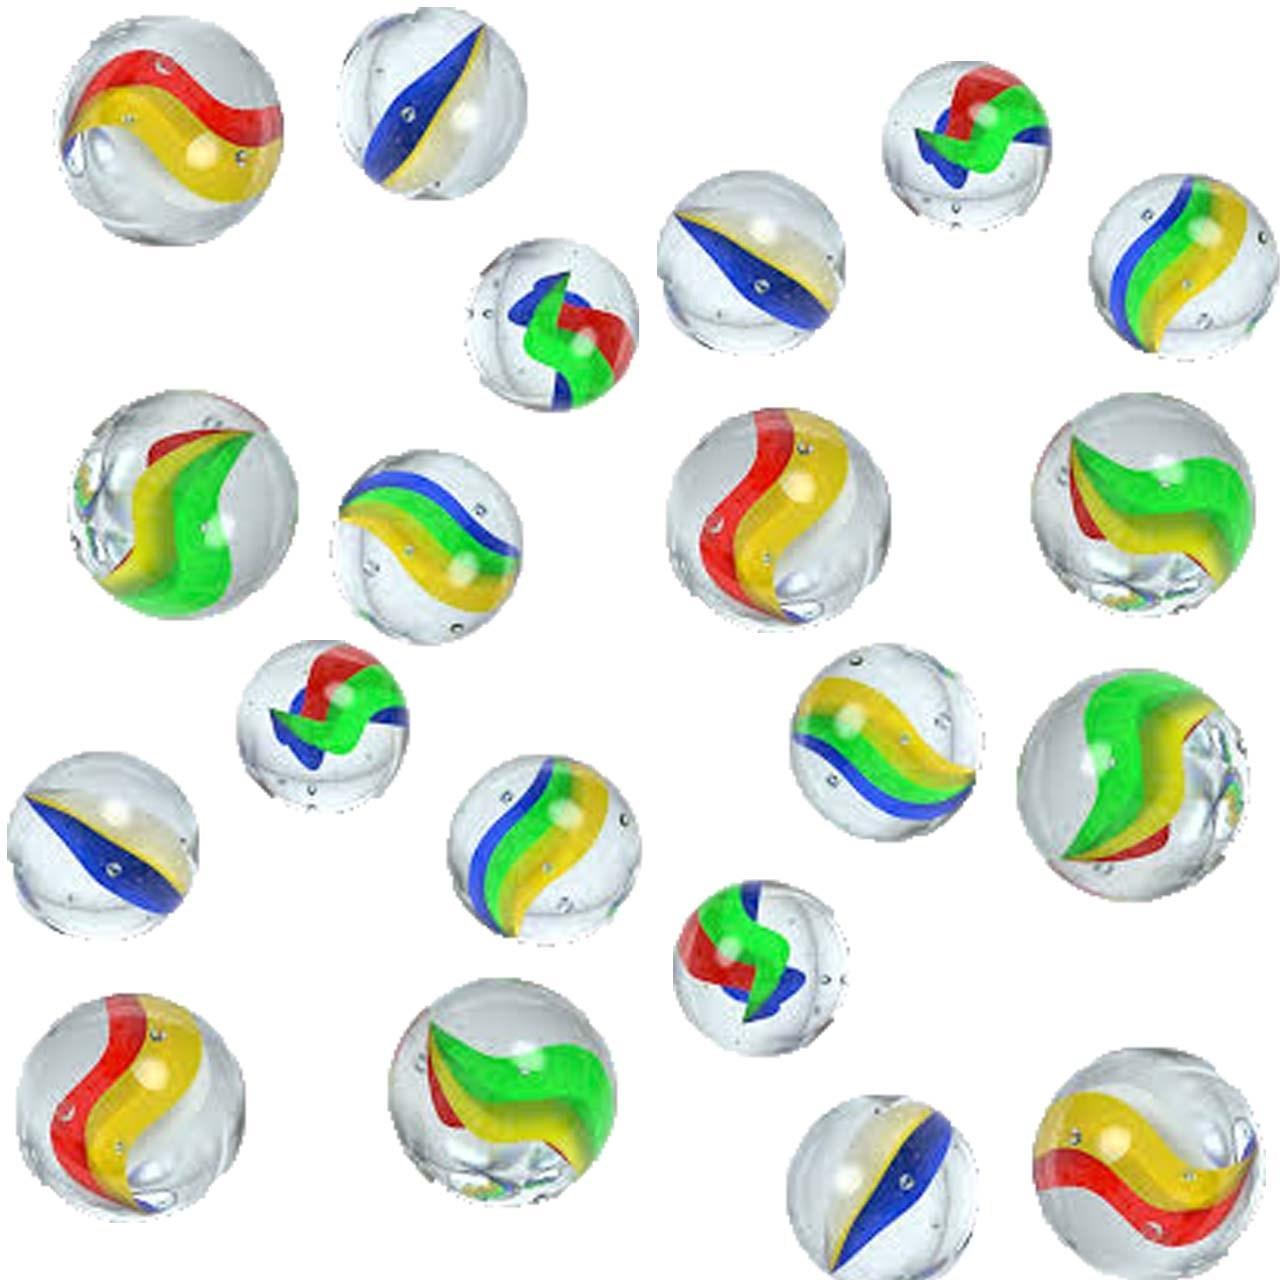 تیله شیشه ای کیان مدل پنج پر بسته 20 عددی